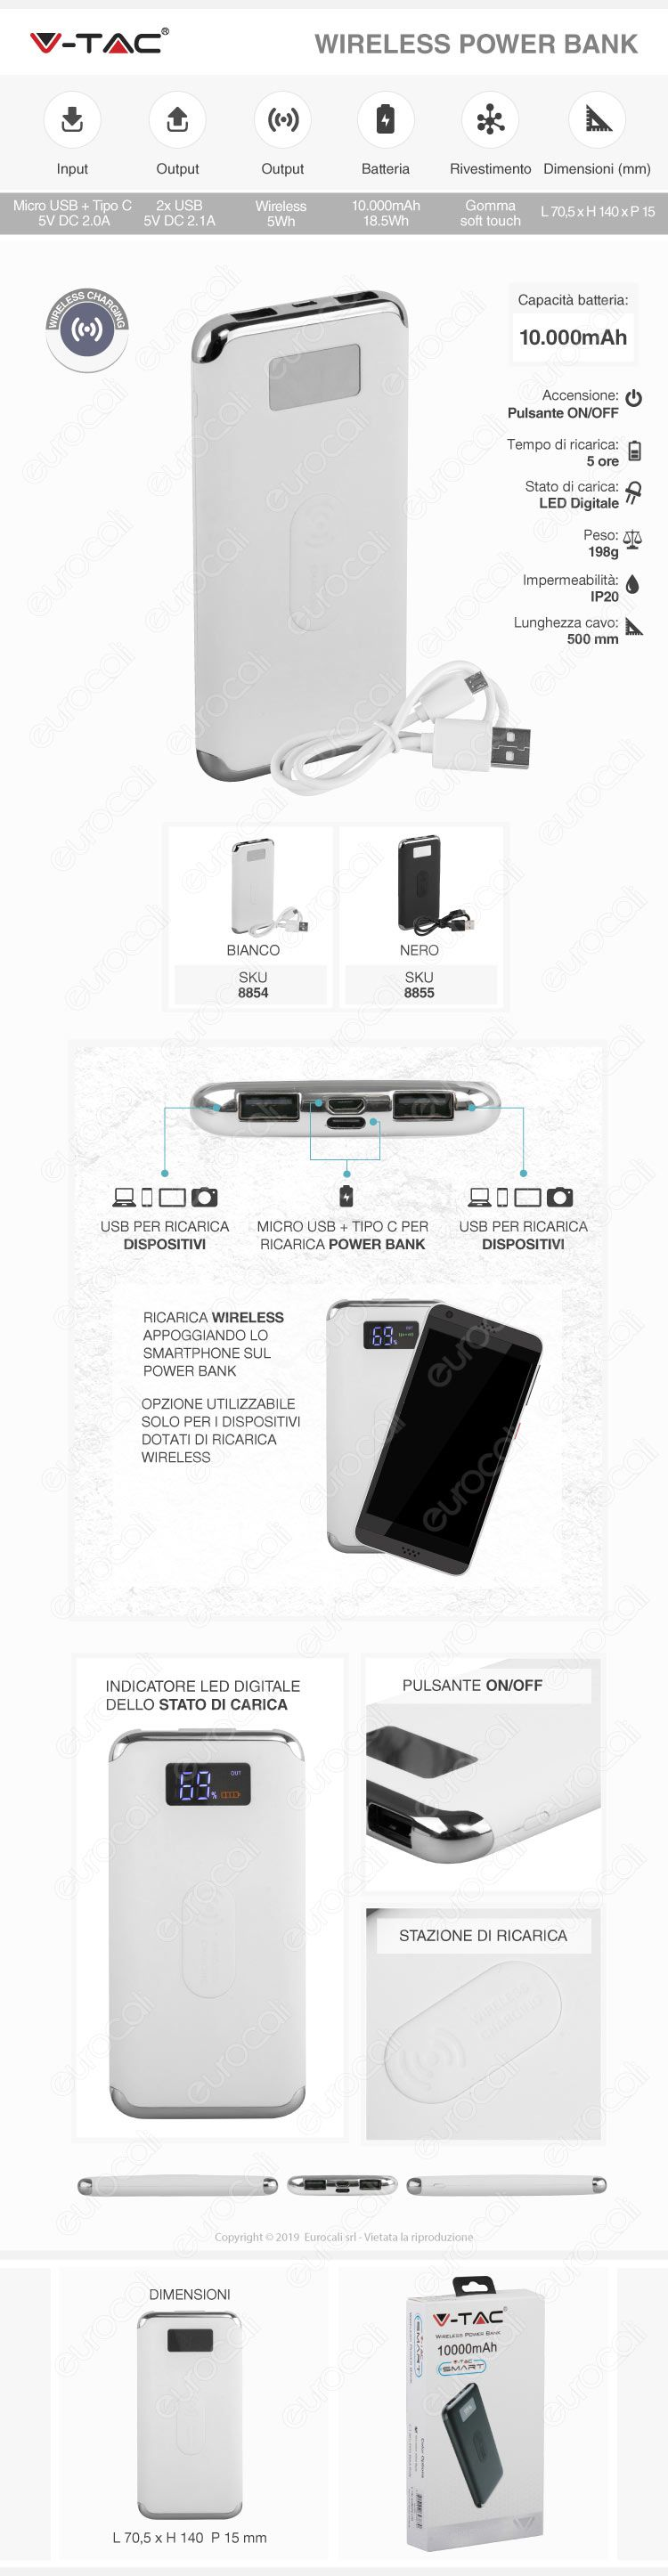 V-Tac VT-3505 Power Bank con Ricarica Wireless 10000 mAh 2 Uscite USB 2,1A